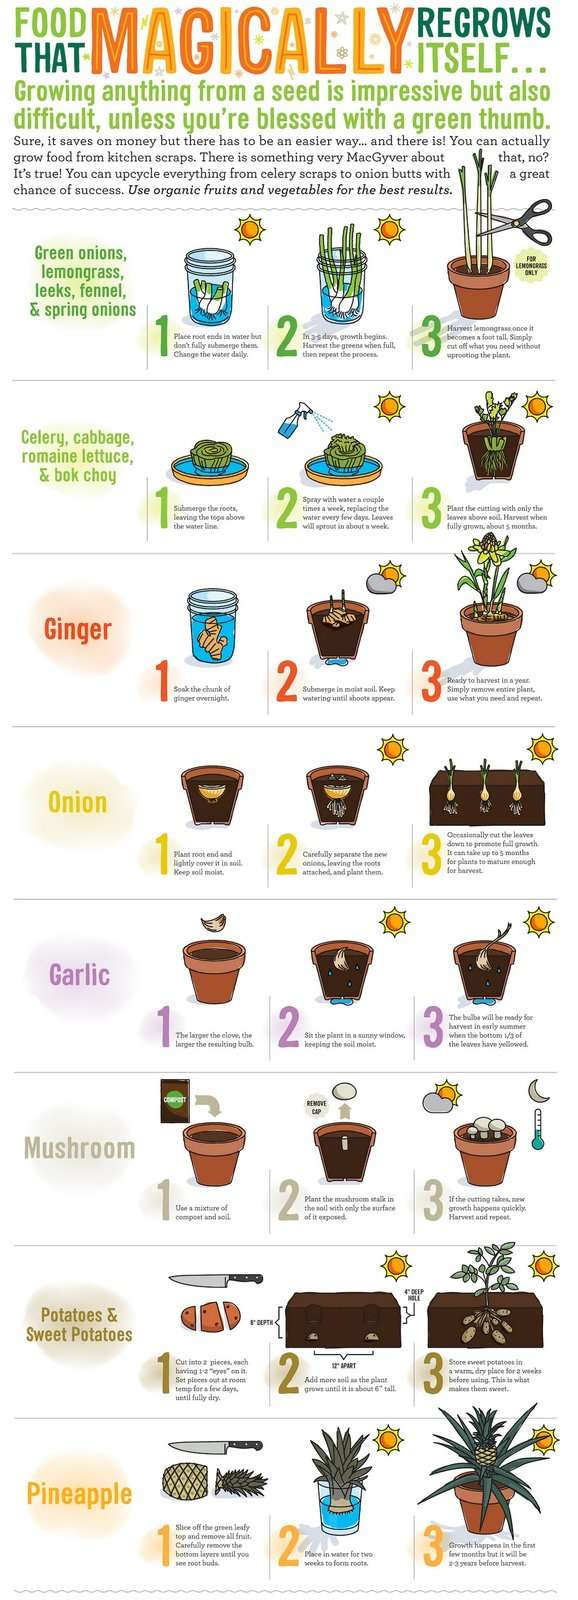 magically regrowing food.